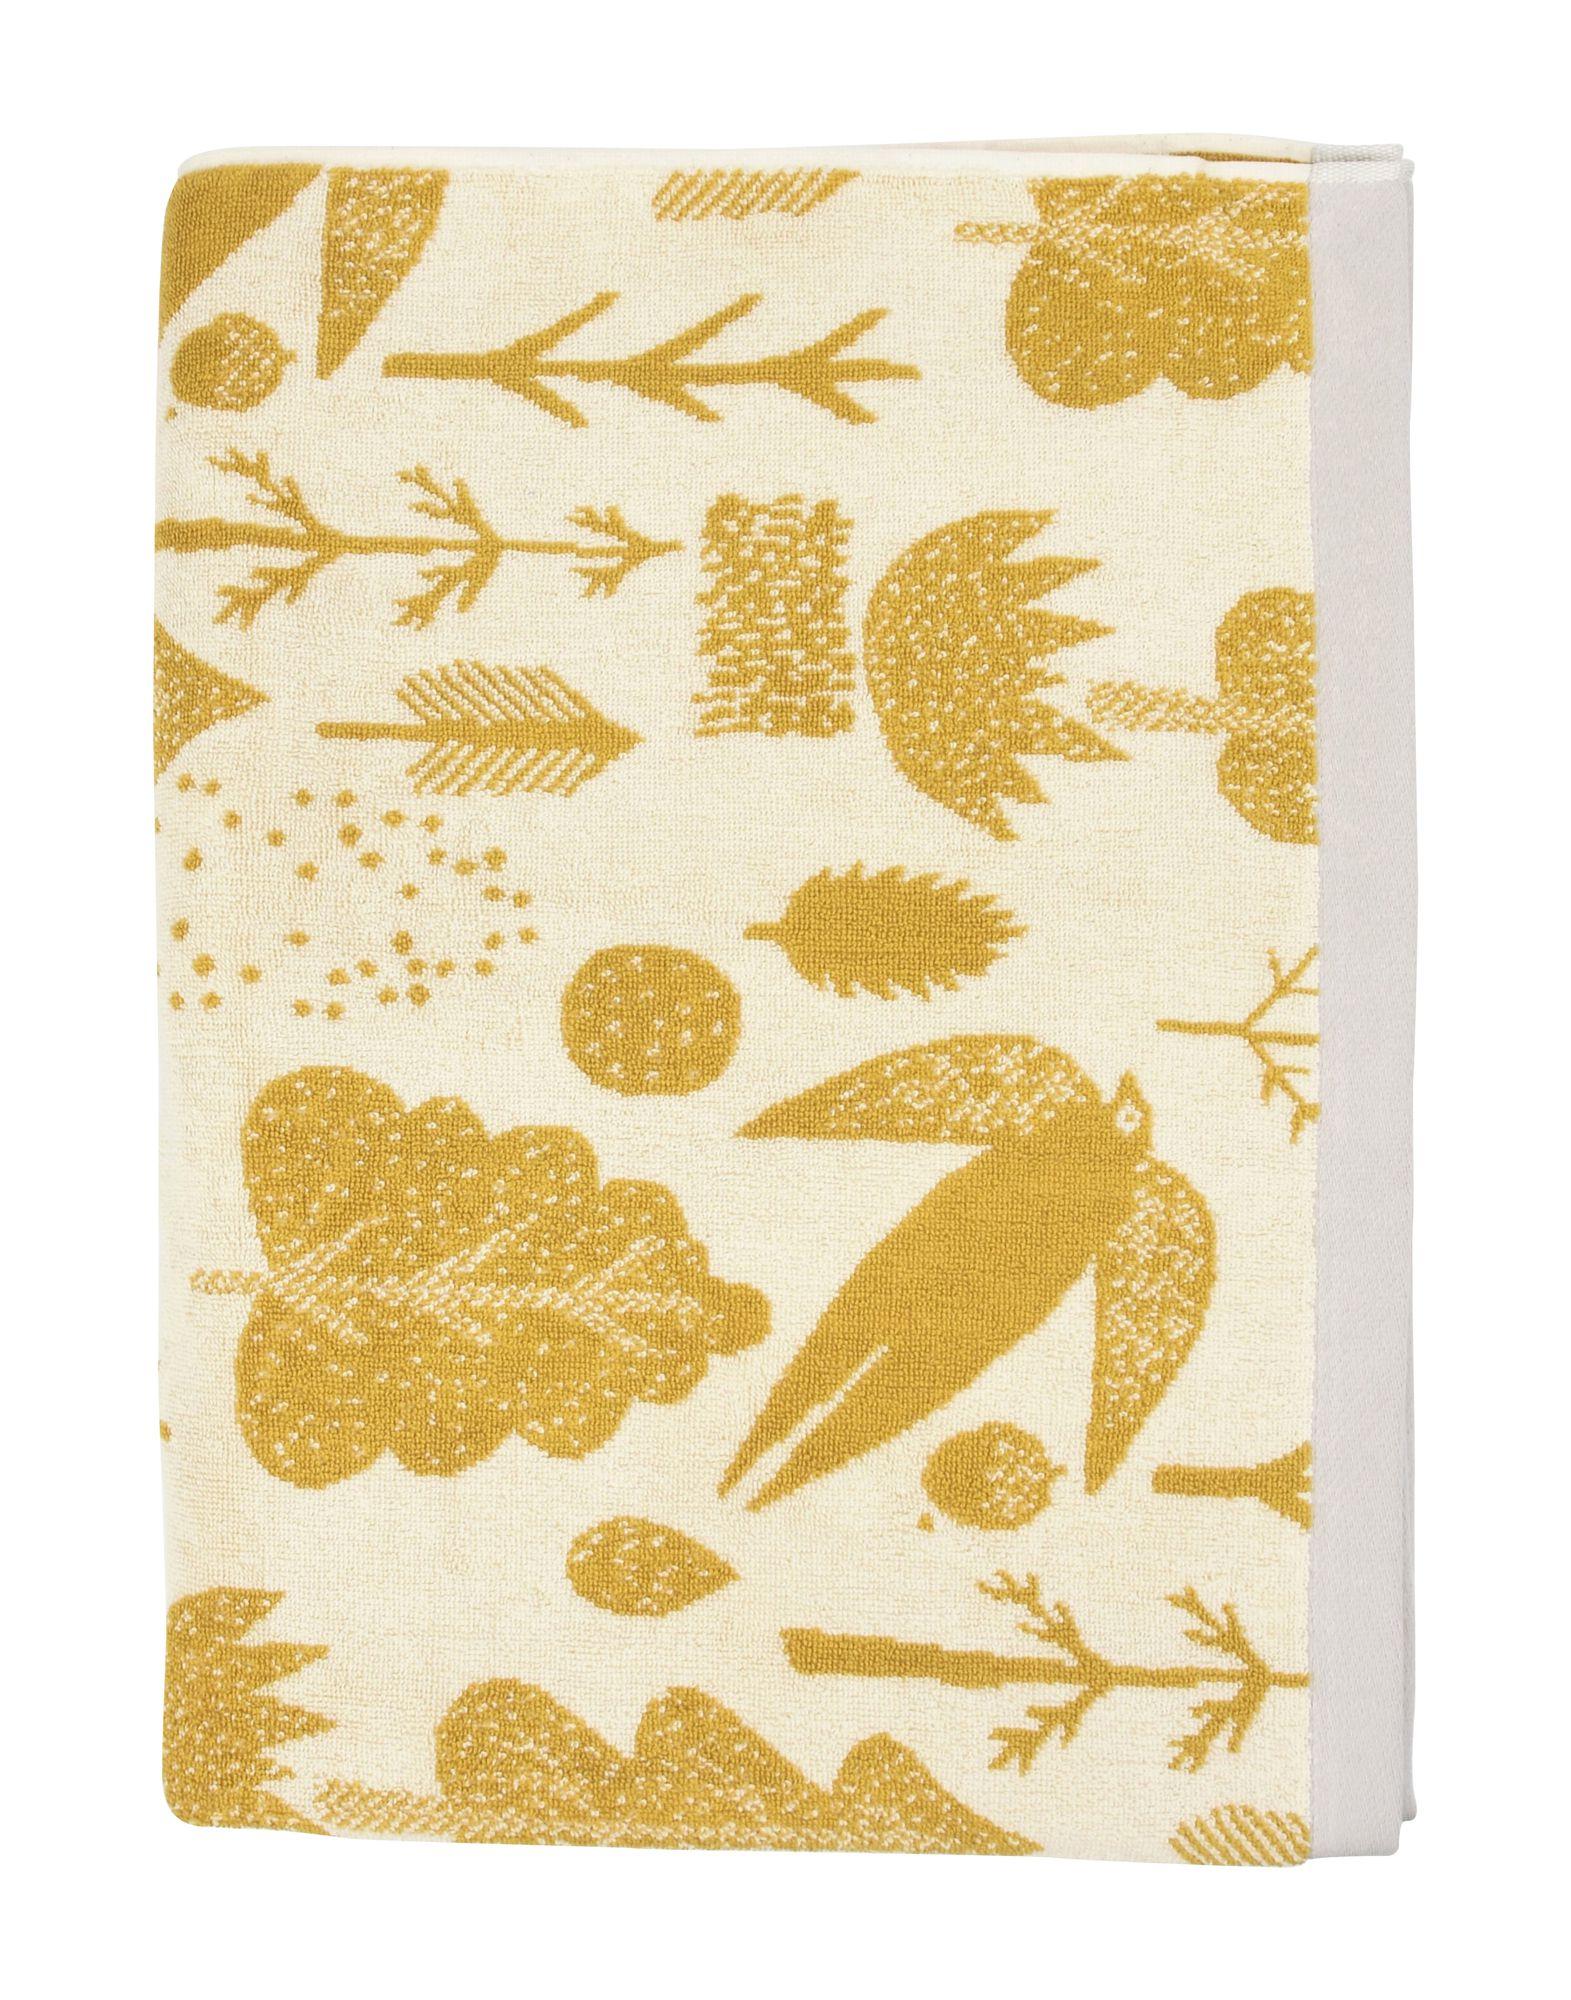 Donna Wilson Bird Tree Cream Sheet